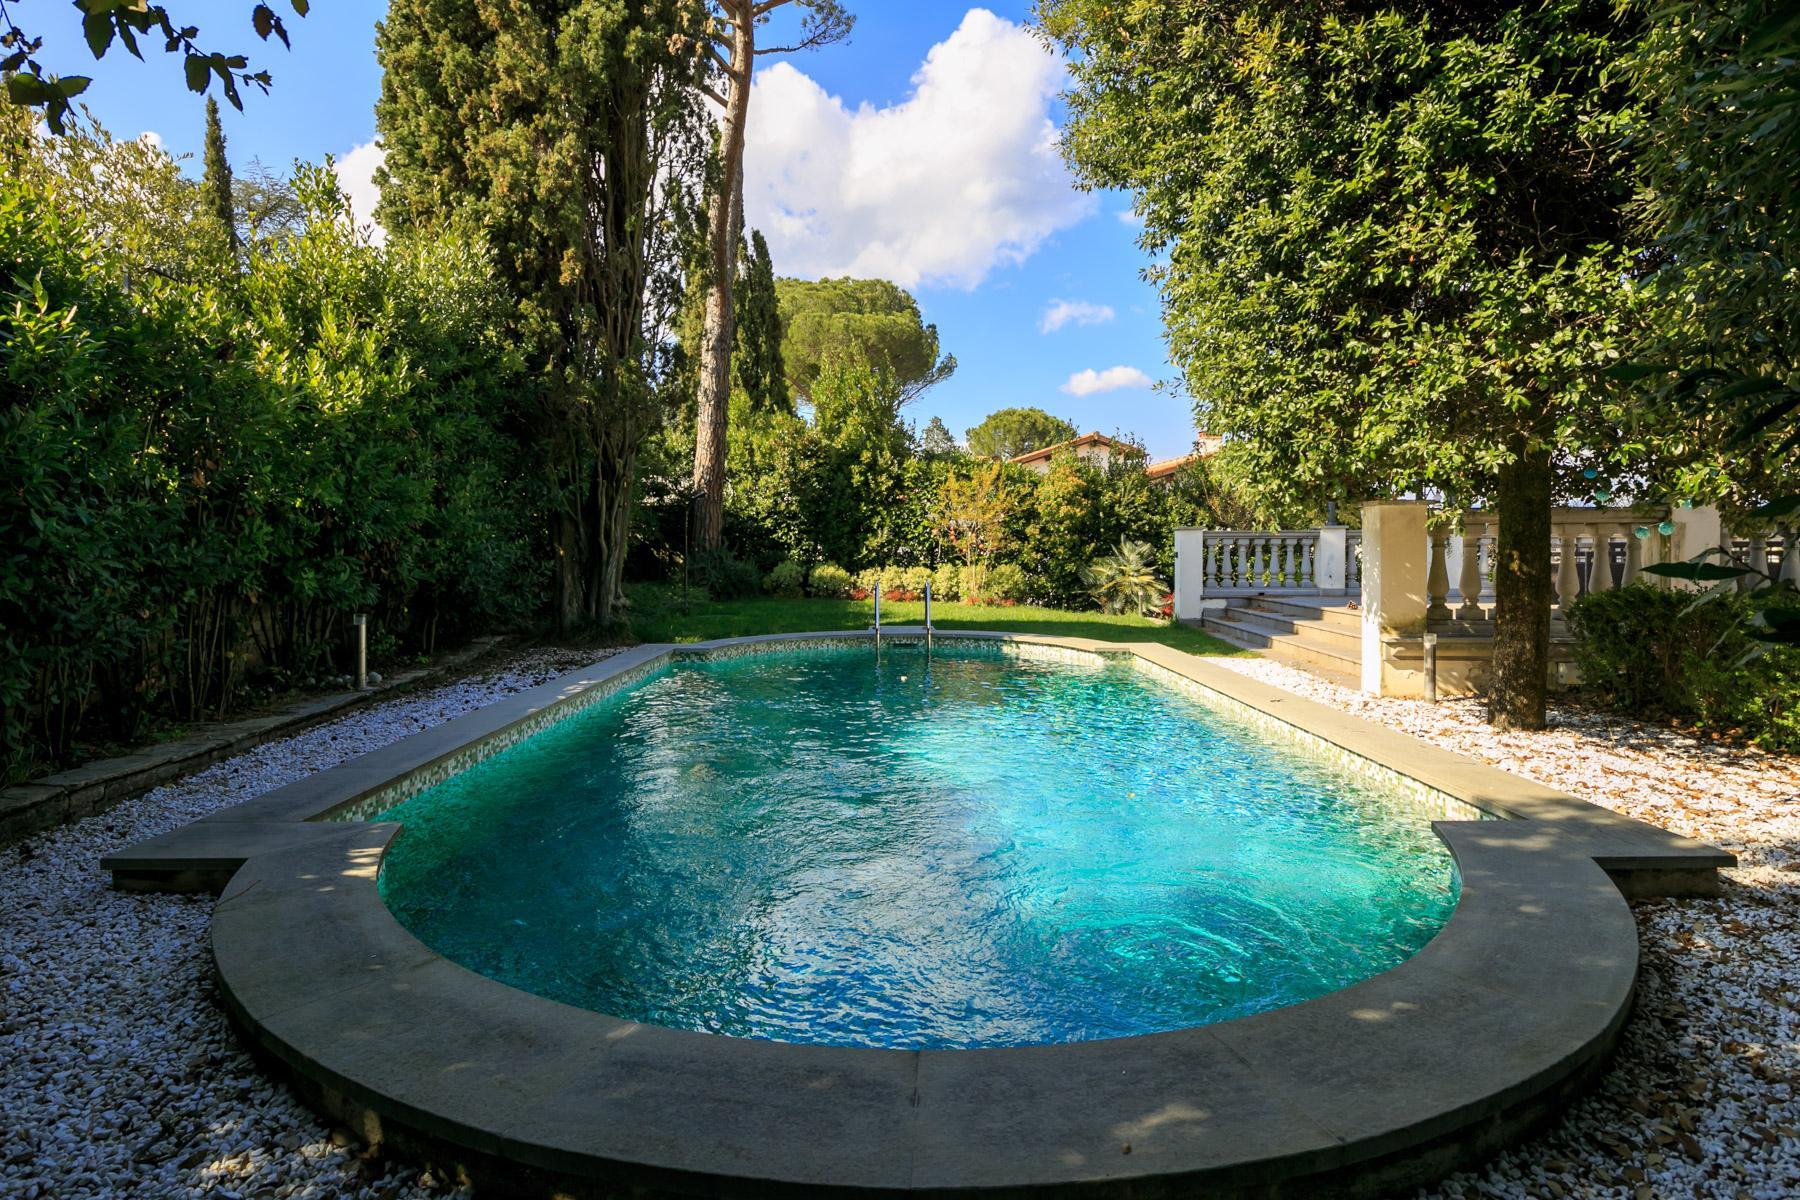 Splendide villa avec piscine à Pian dei Giullari à Florence - 7